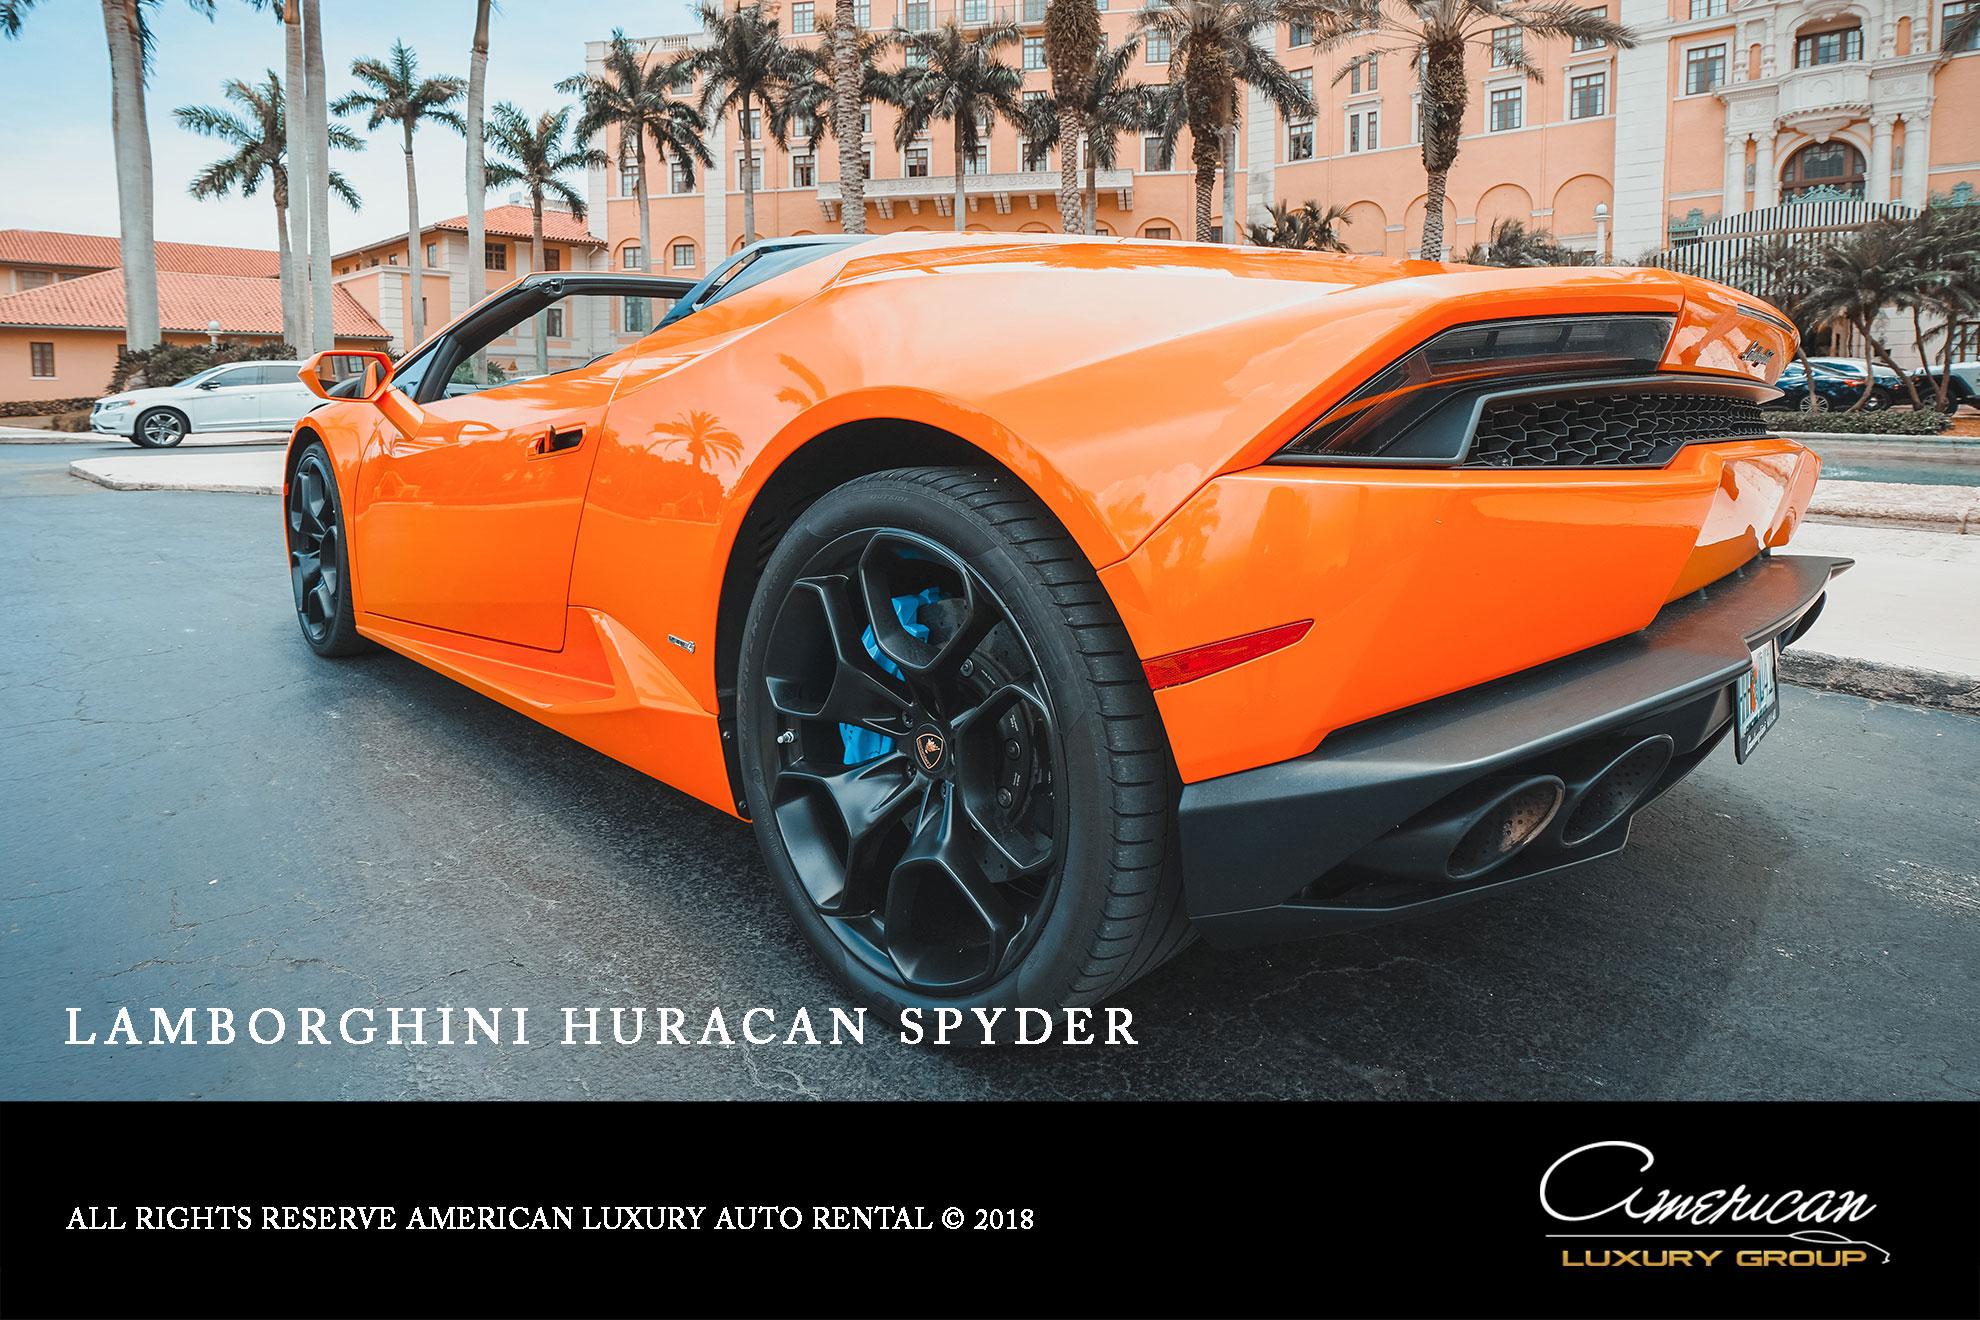 Lamborghini Huracan Spyder Rental In Orlando American Luxury Auto